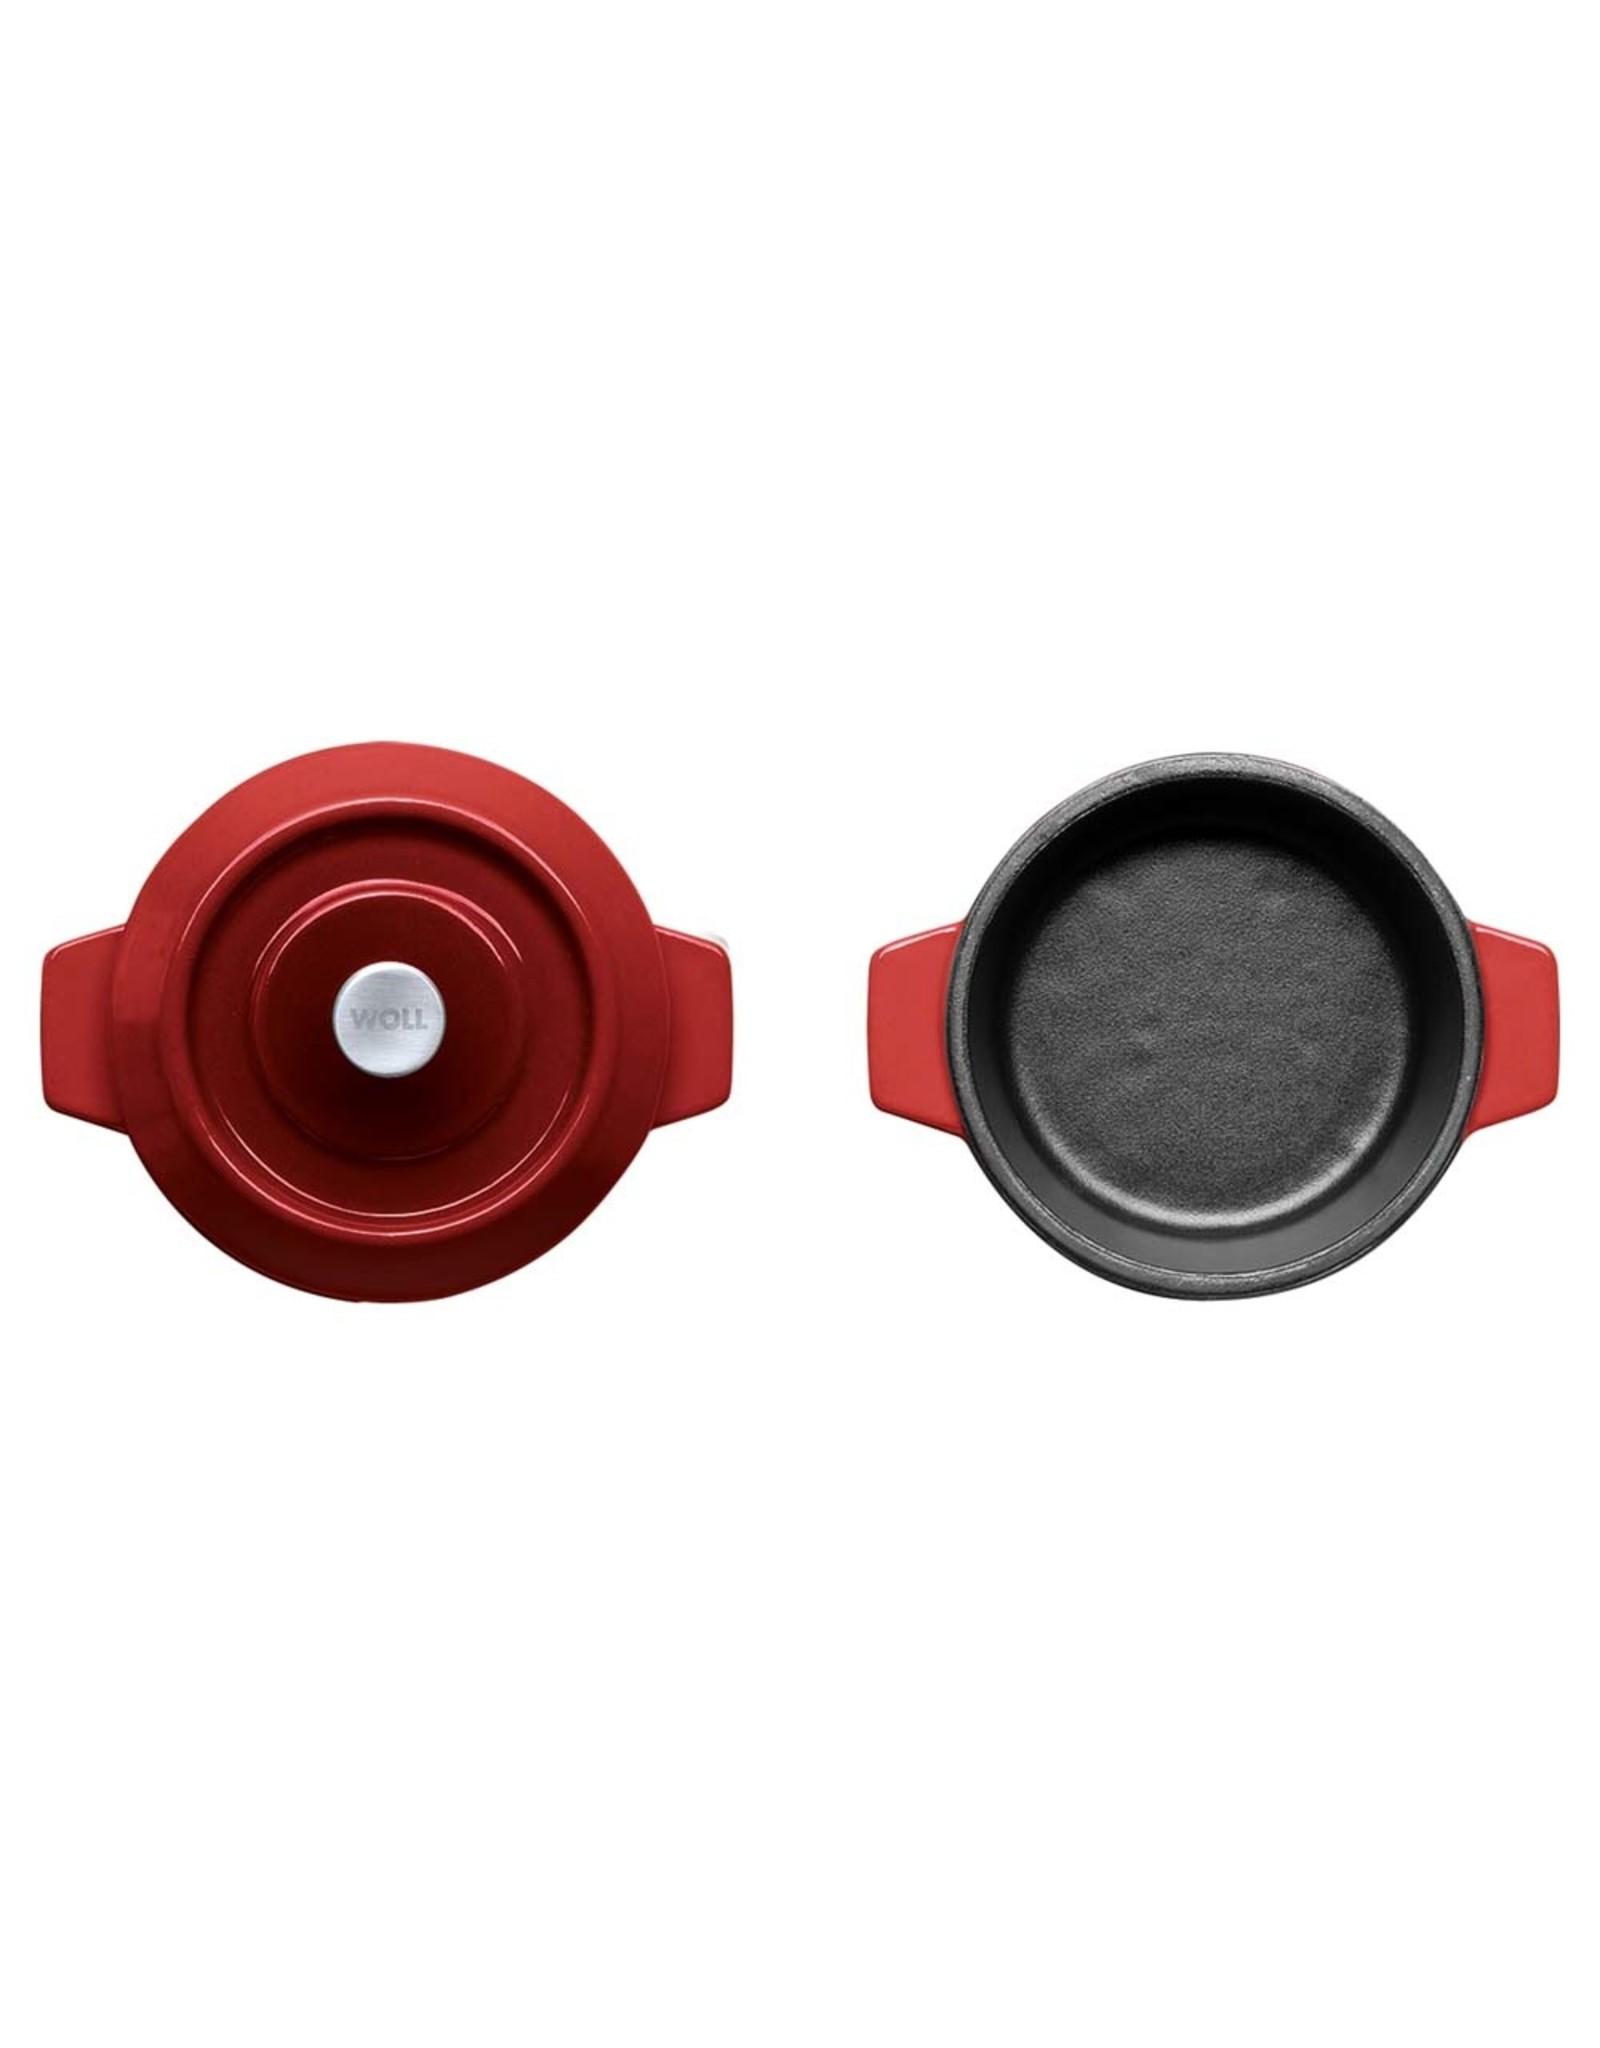 WOLL WOLL 110CI-010 IRON CASSEROLES 0.3 LTR 10X5CM CHILI RED